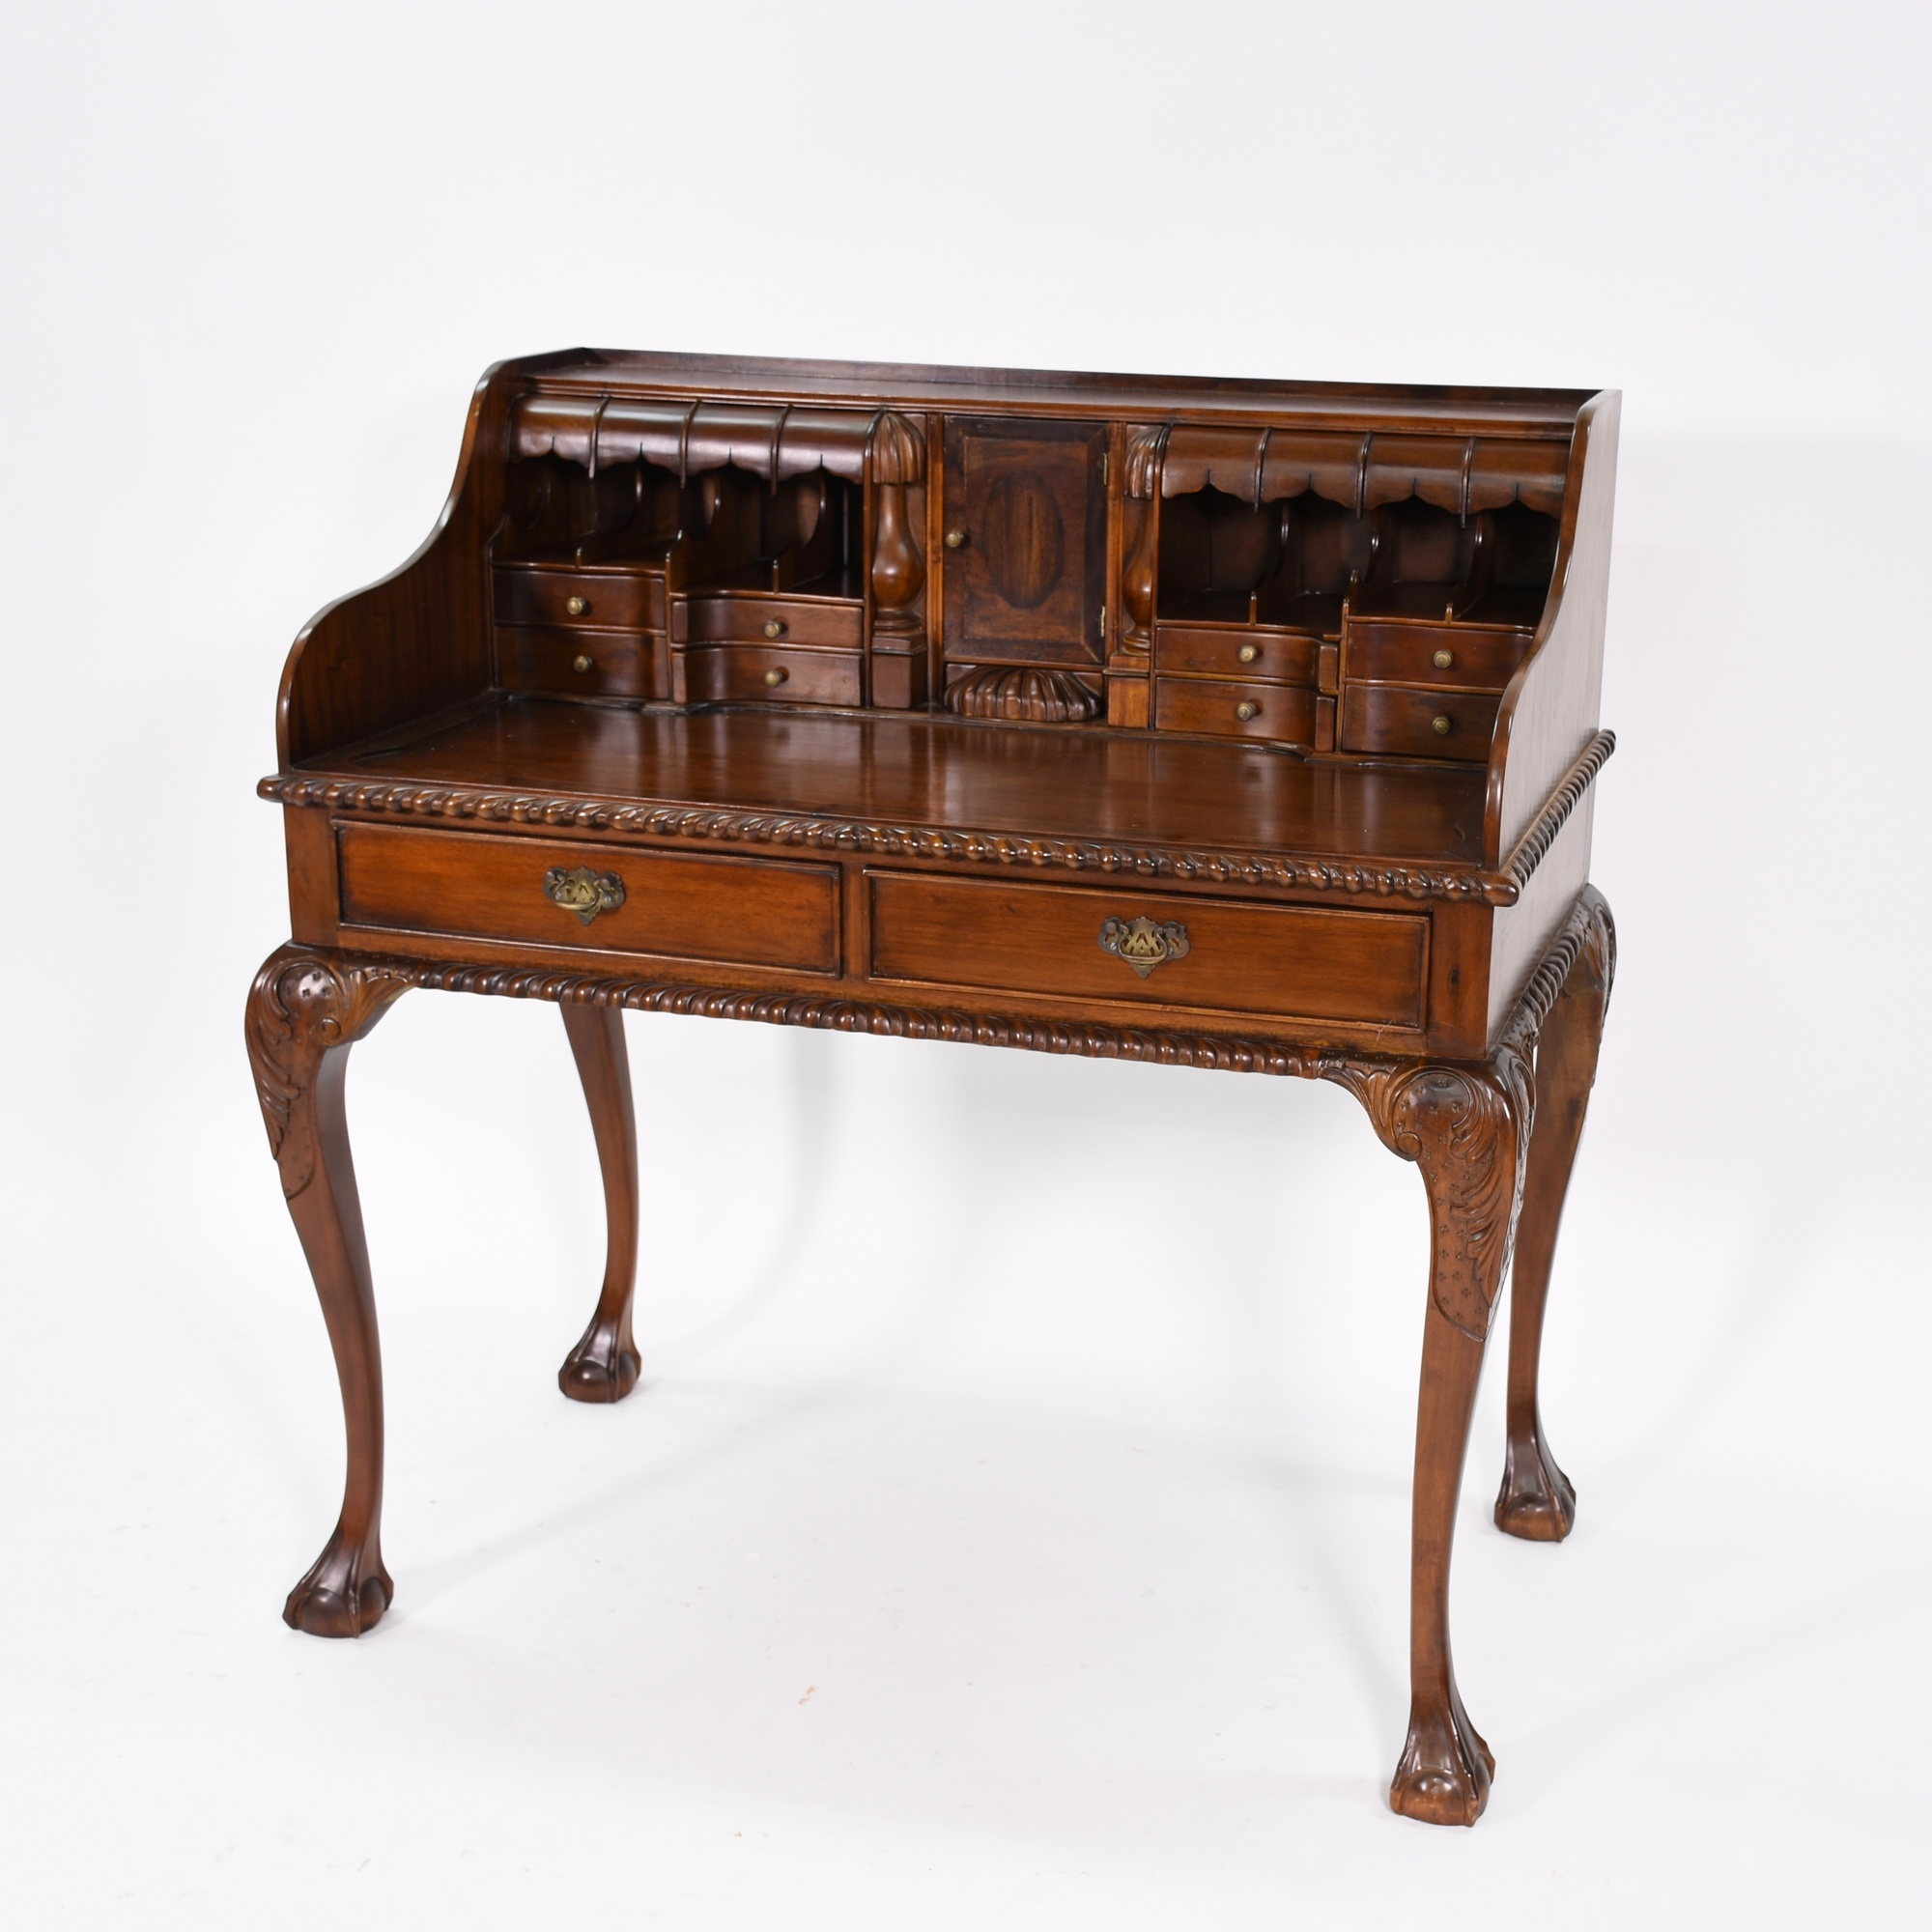 Wonderful image of vintage writing desk $ 200 00 beautiful wooden vintage writing desk  with #6F3D26 color and 2000x2000 pixels